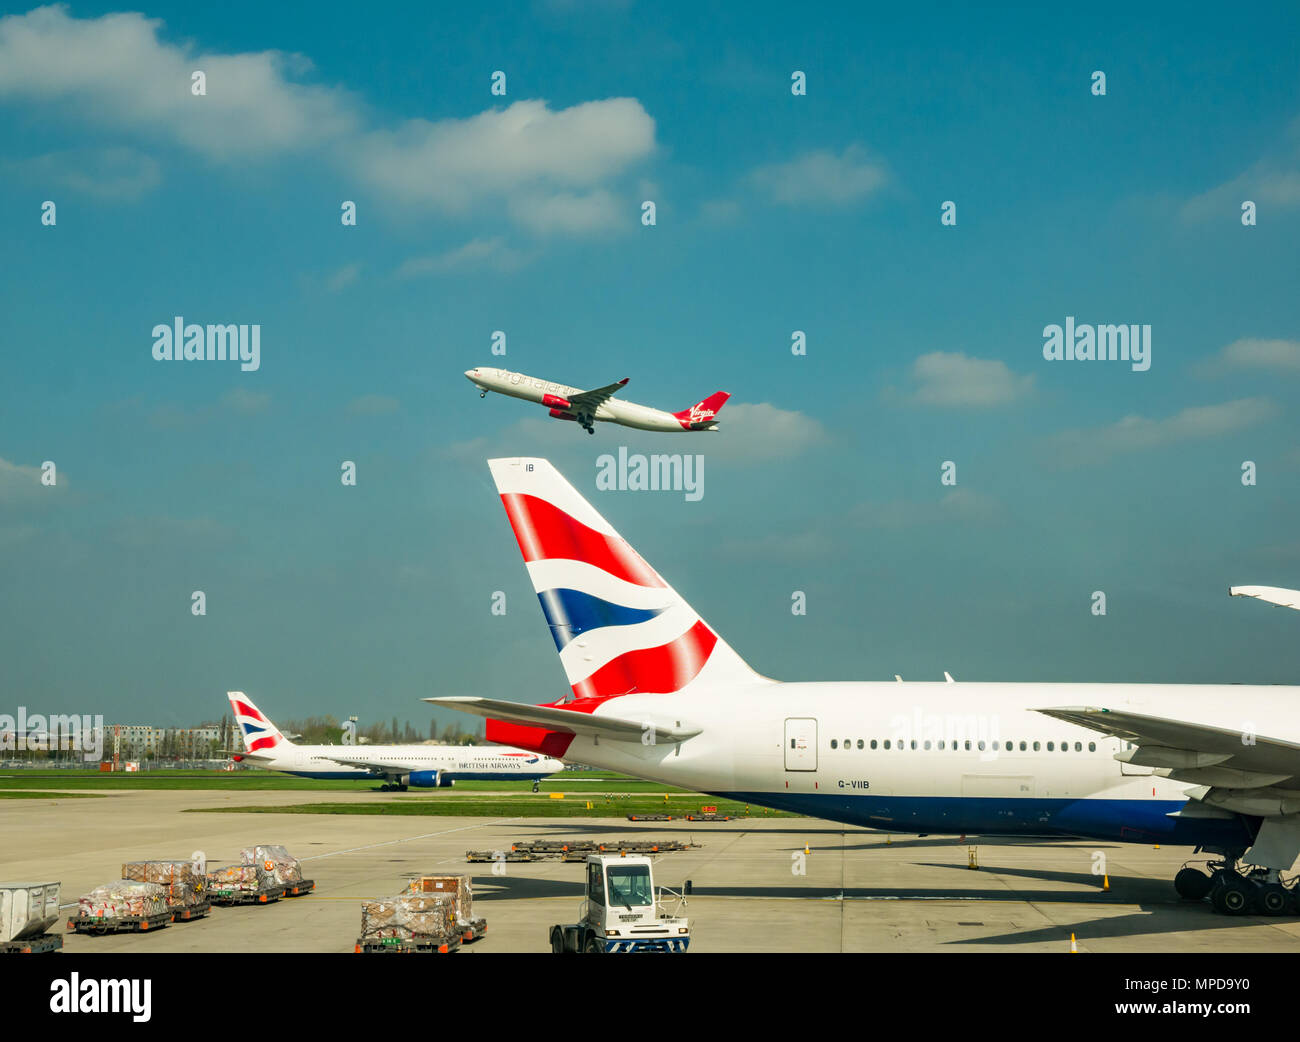 British Airways Boeing 777 on airport apron, Virgin Atlantic aeroplane taking off in blue sky, Terminal 5, Heathrow airport, London, England, UK Stock Photo